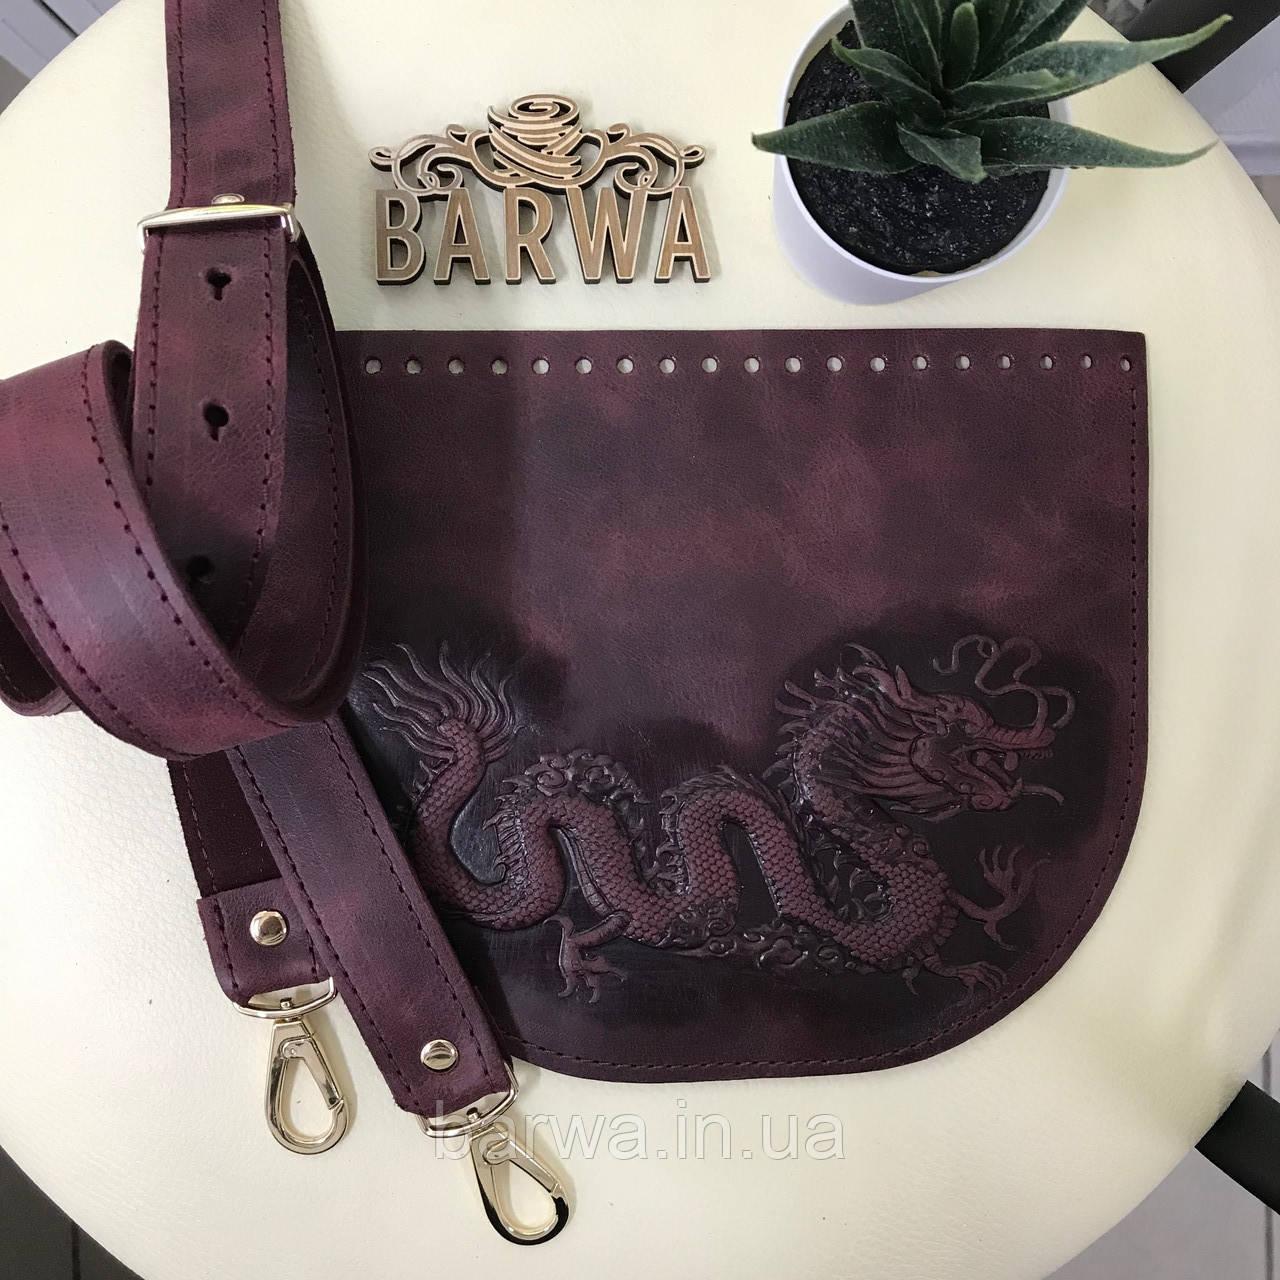 Набор для сумки натуральная кожа (крейзи хорс) цвет бордо серия люкс